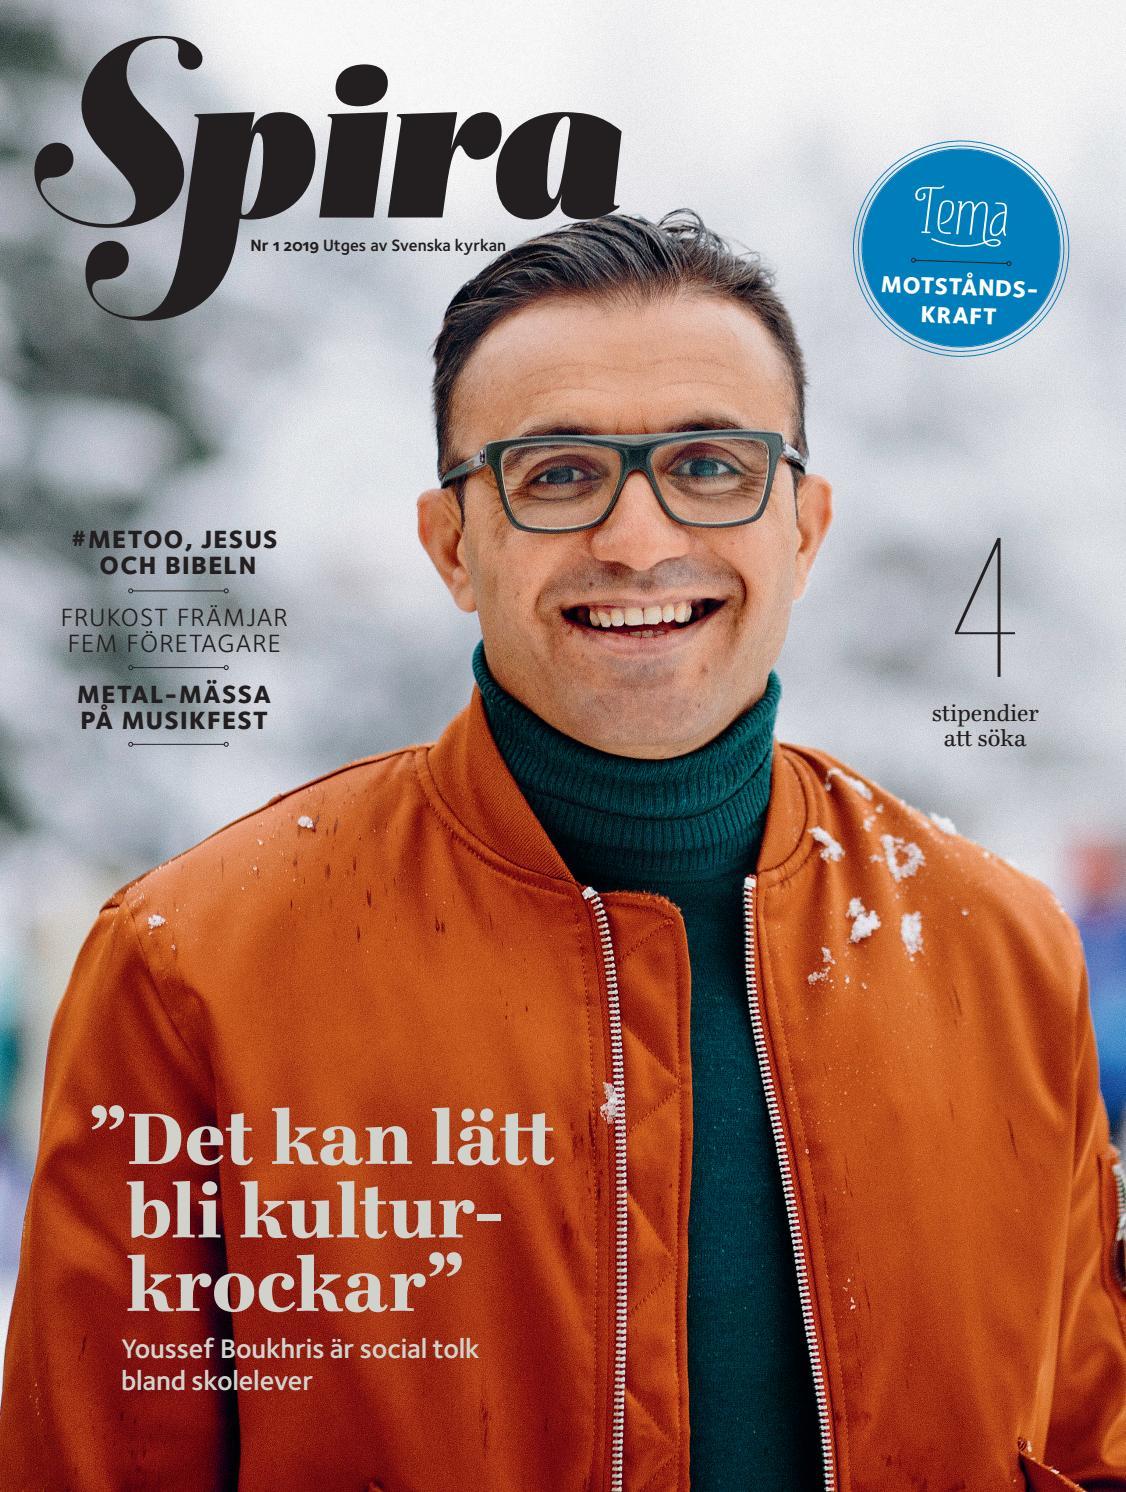 Annevi Berglin, 54 r i Ume p Kungsgatan 31 - Mrkoll